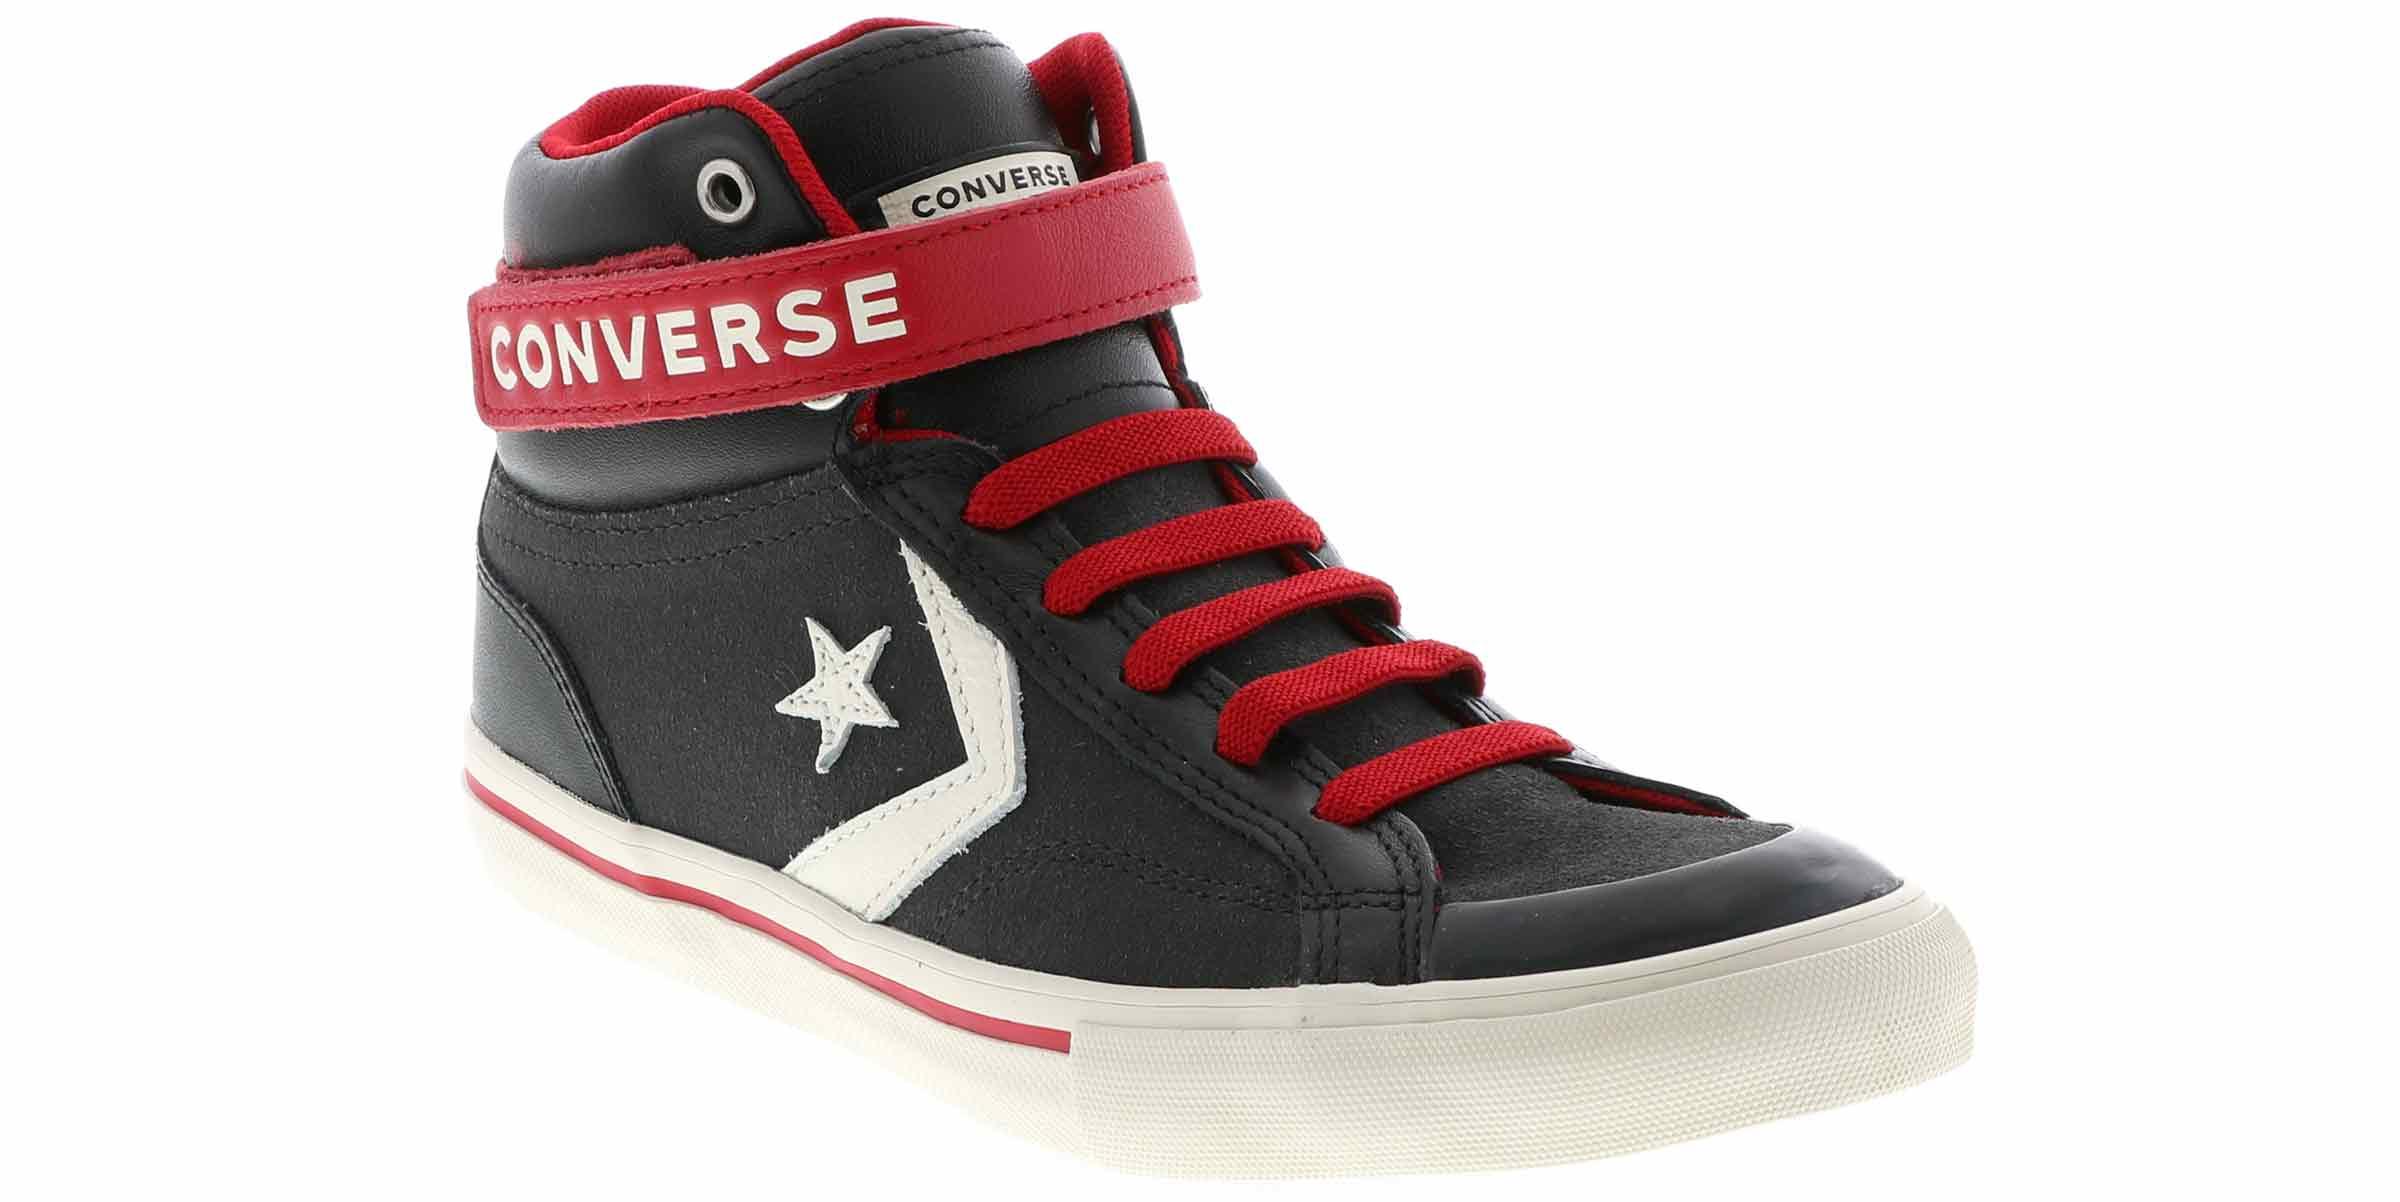 Kid's Converse Pro Blaze Strap Hi (1 6) Charcoal | Shoe